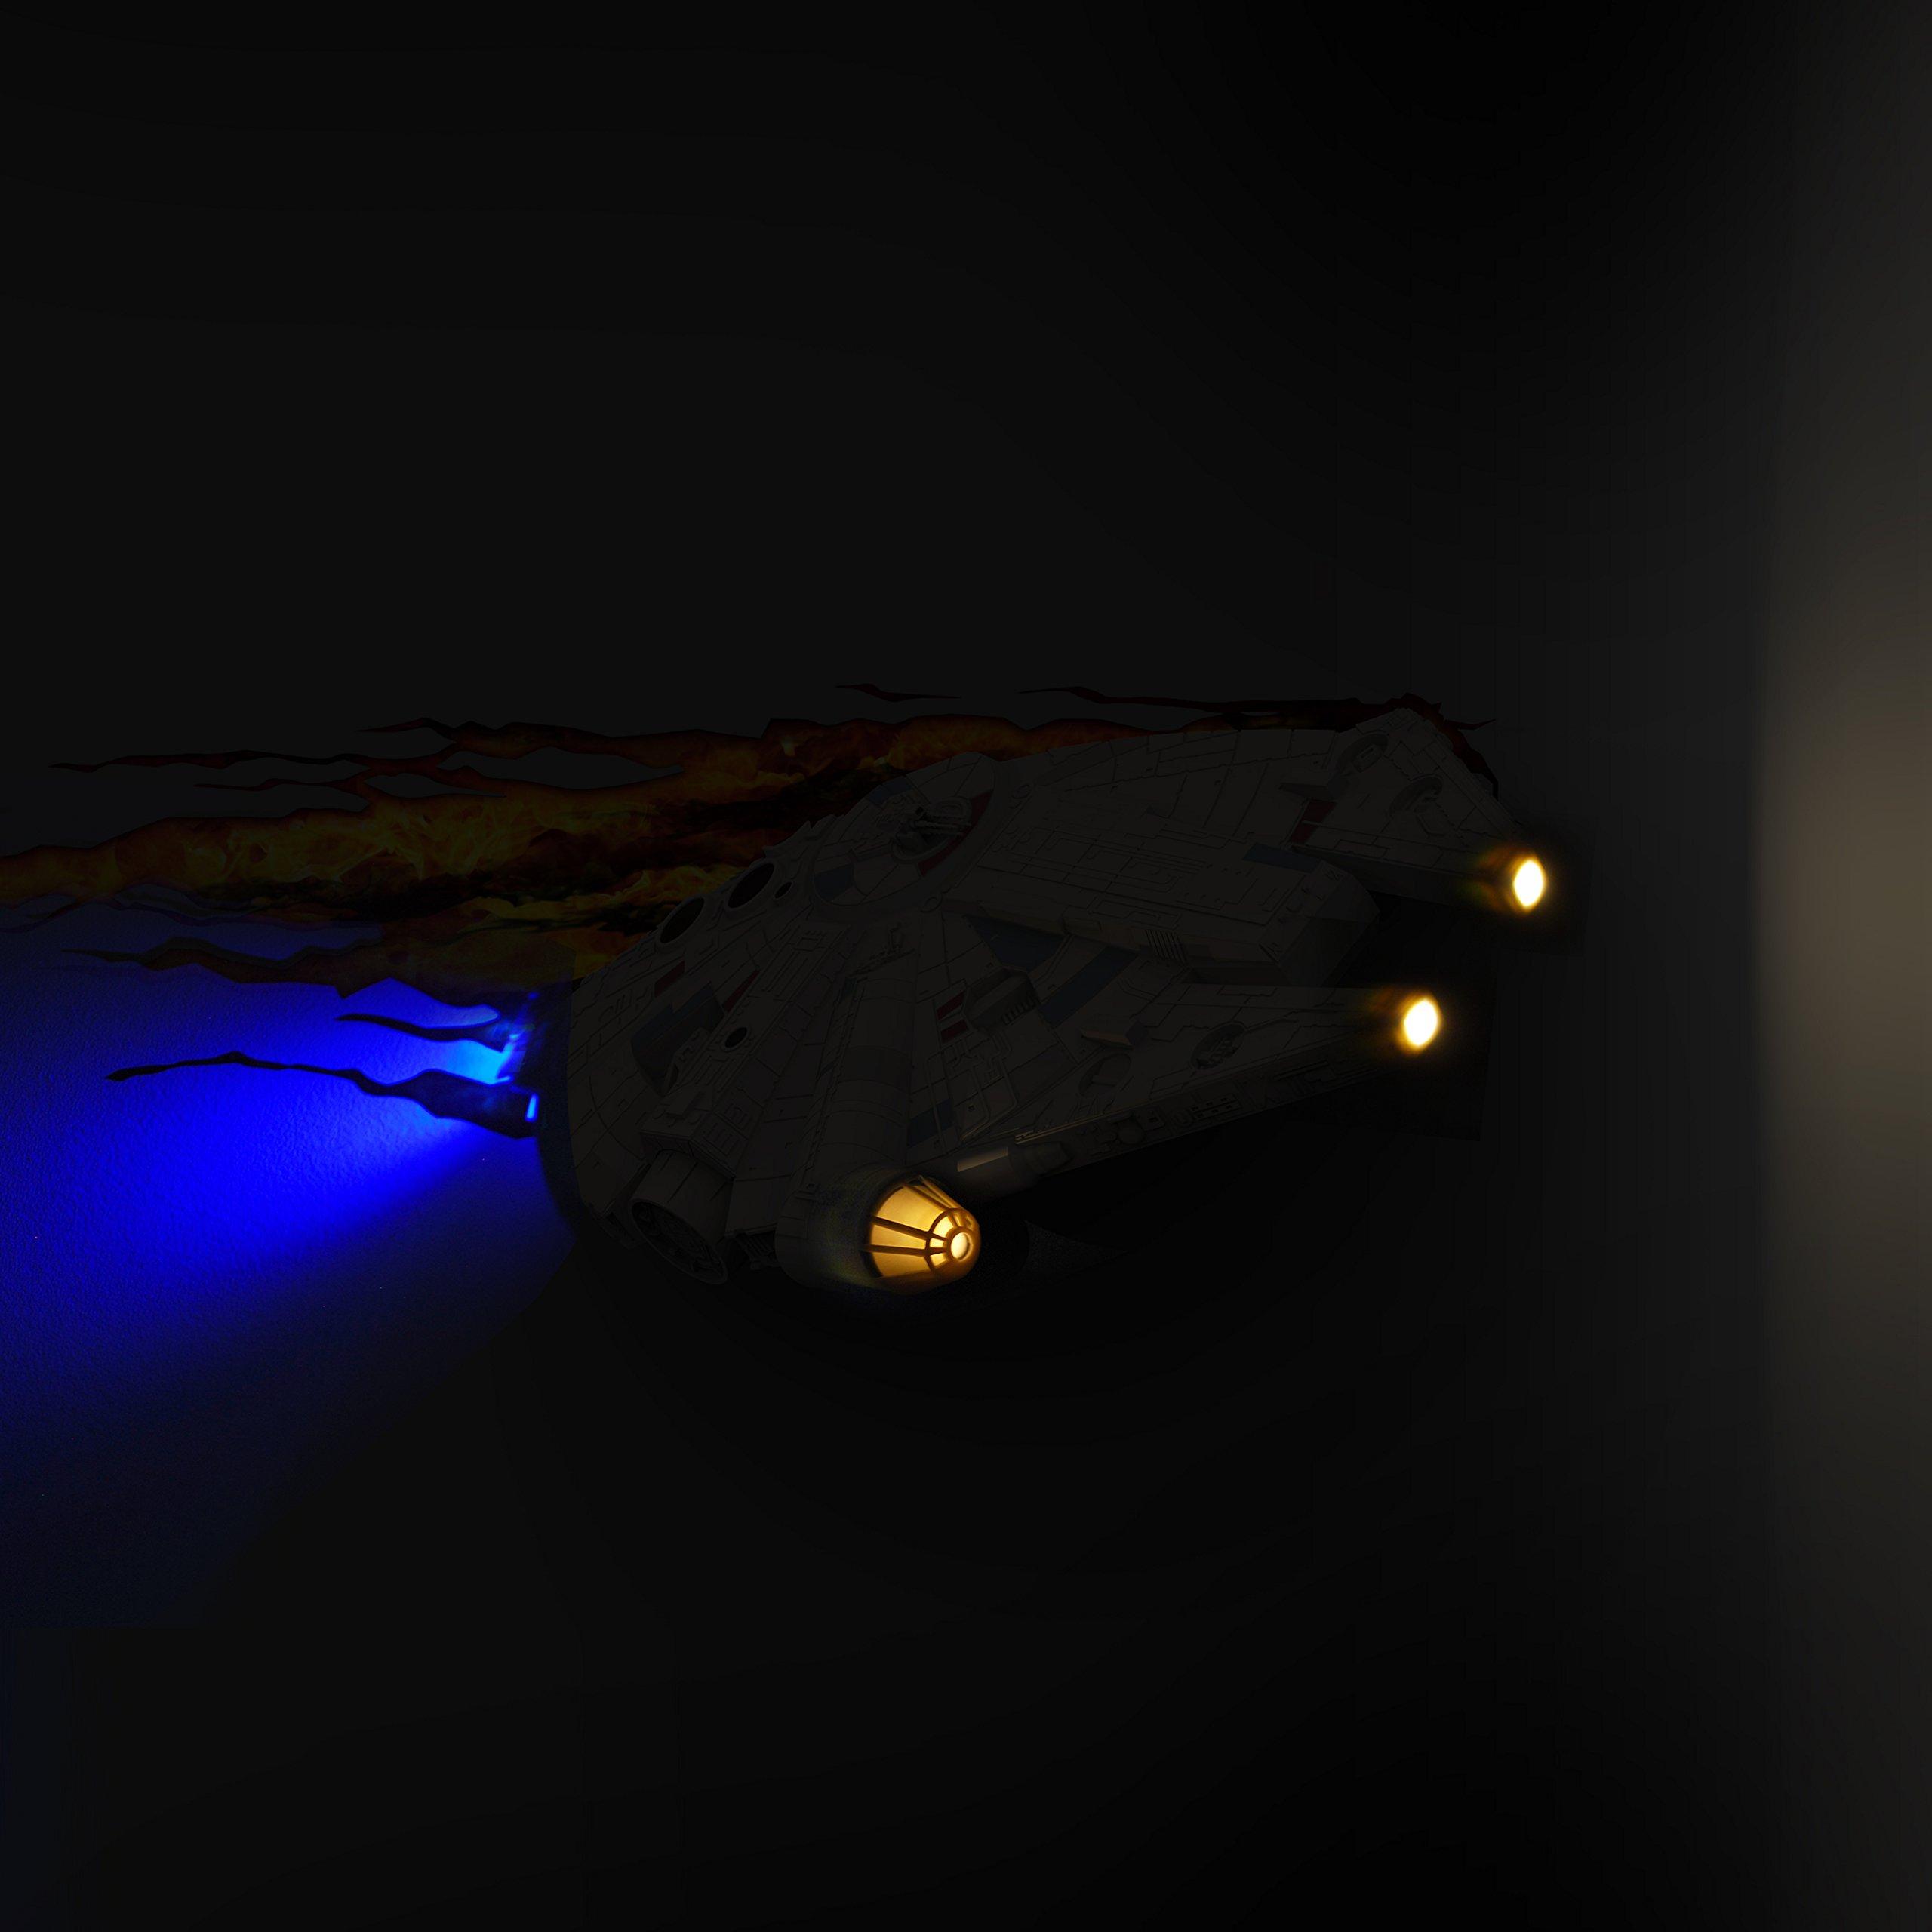 3DLightFX Star Wars Millennium Falcon 3D Deco Light by 3D light FX (Image #2)